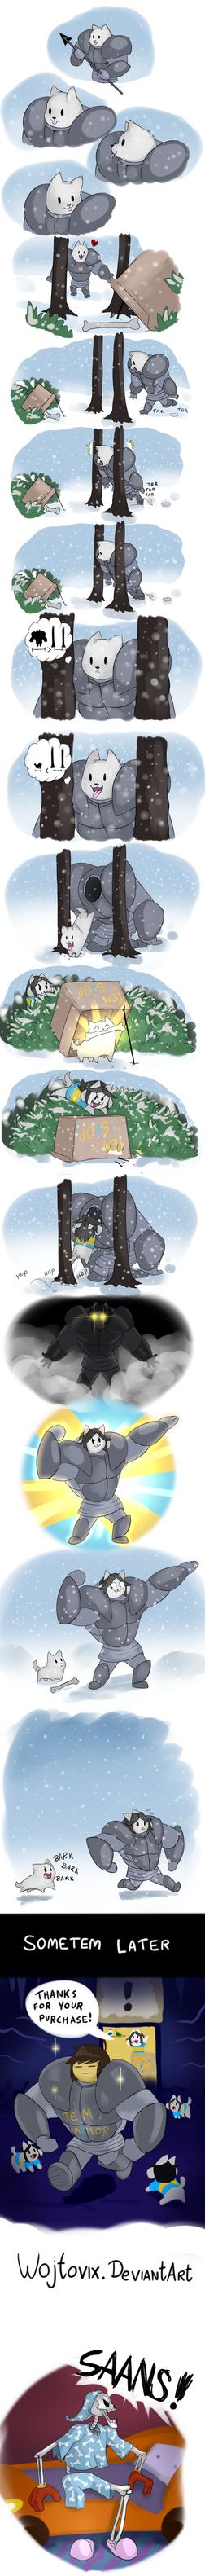 Tem armor origins - Comic by Wojtovix